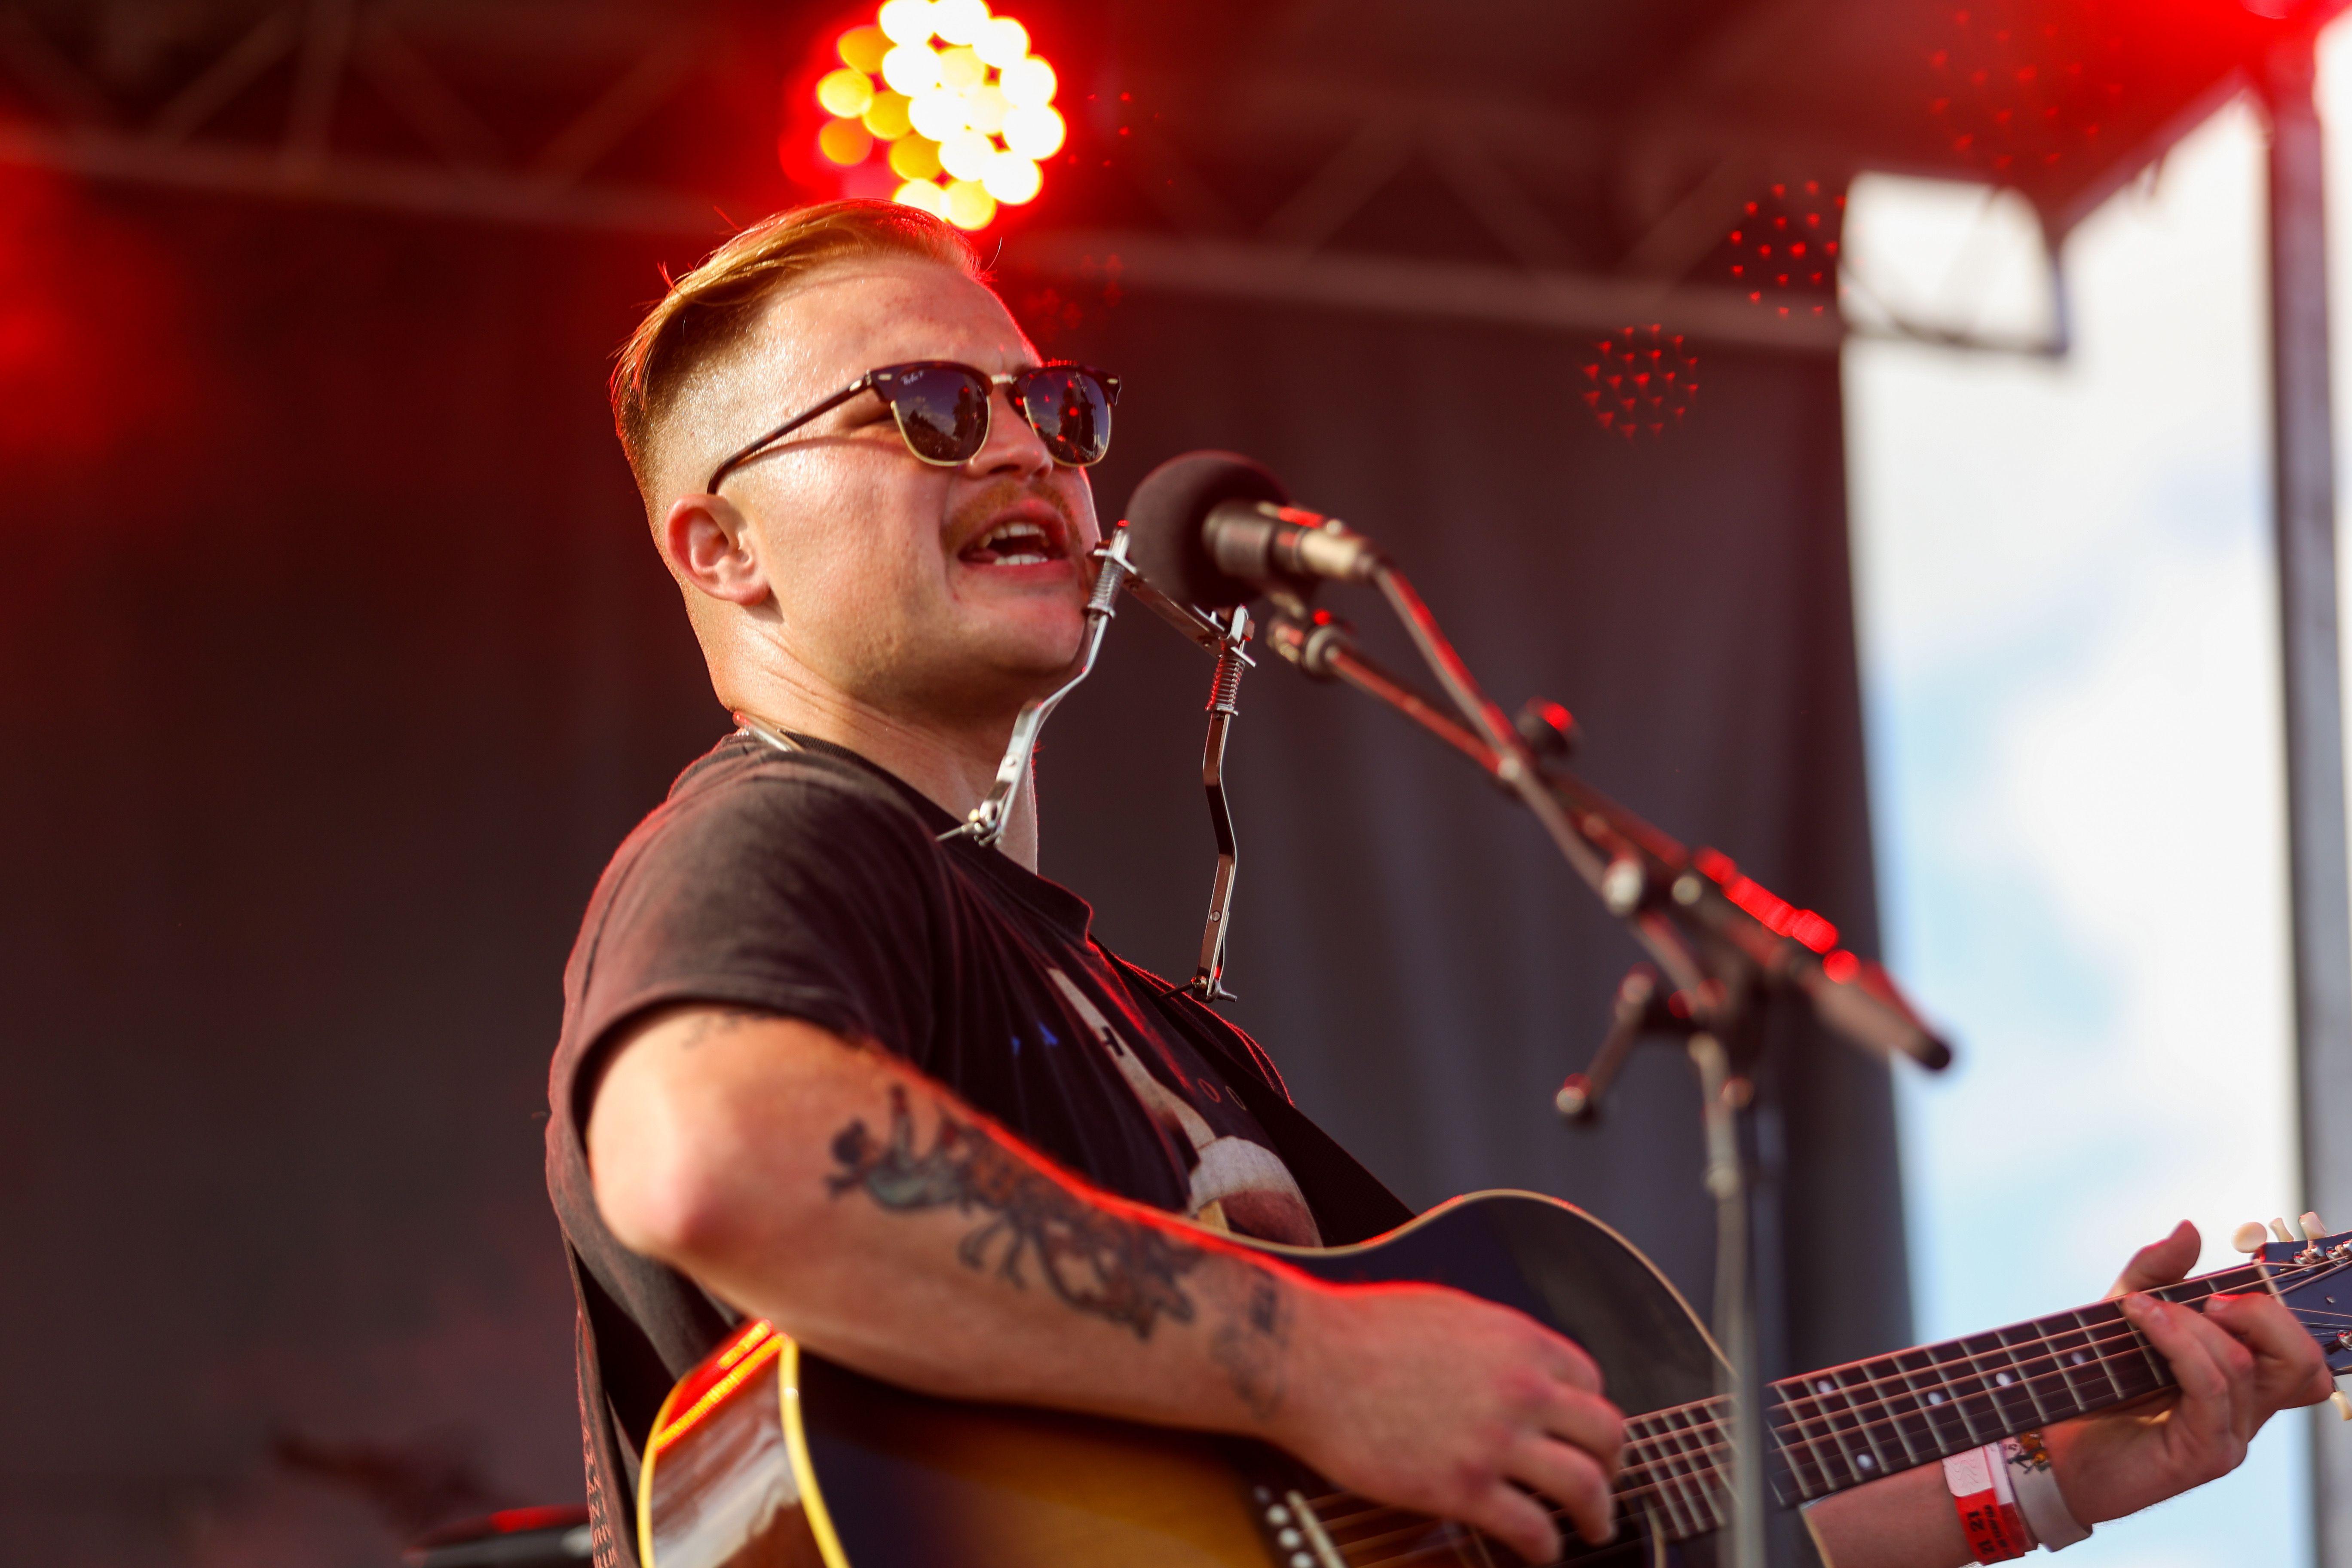 Zach Bryan at Railbird Festival - Holler / Sarah Cahill